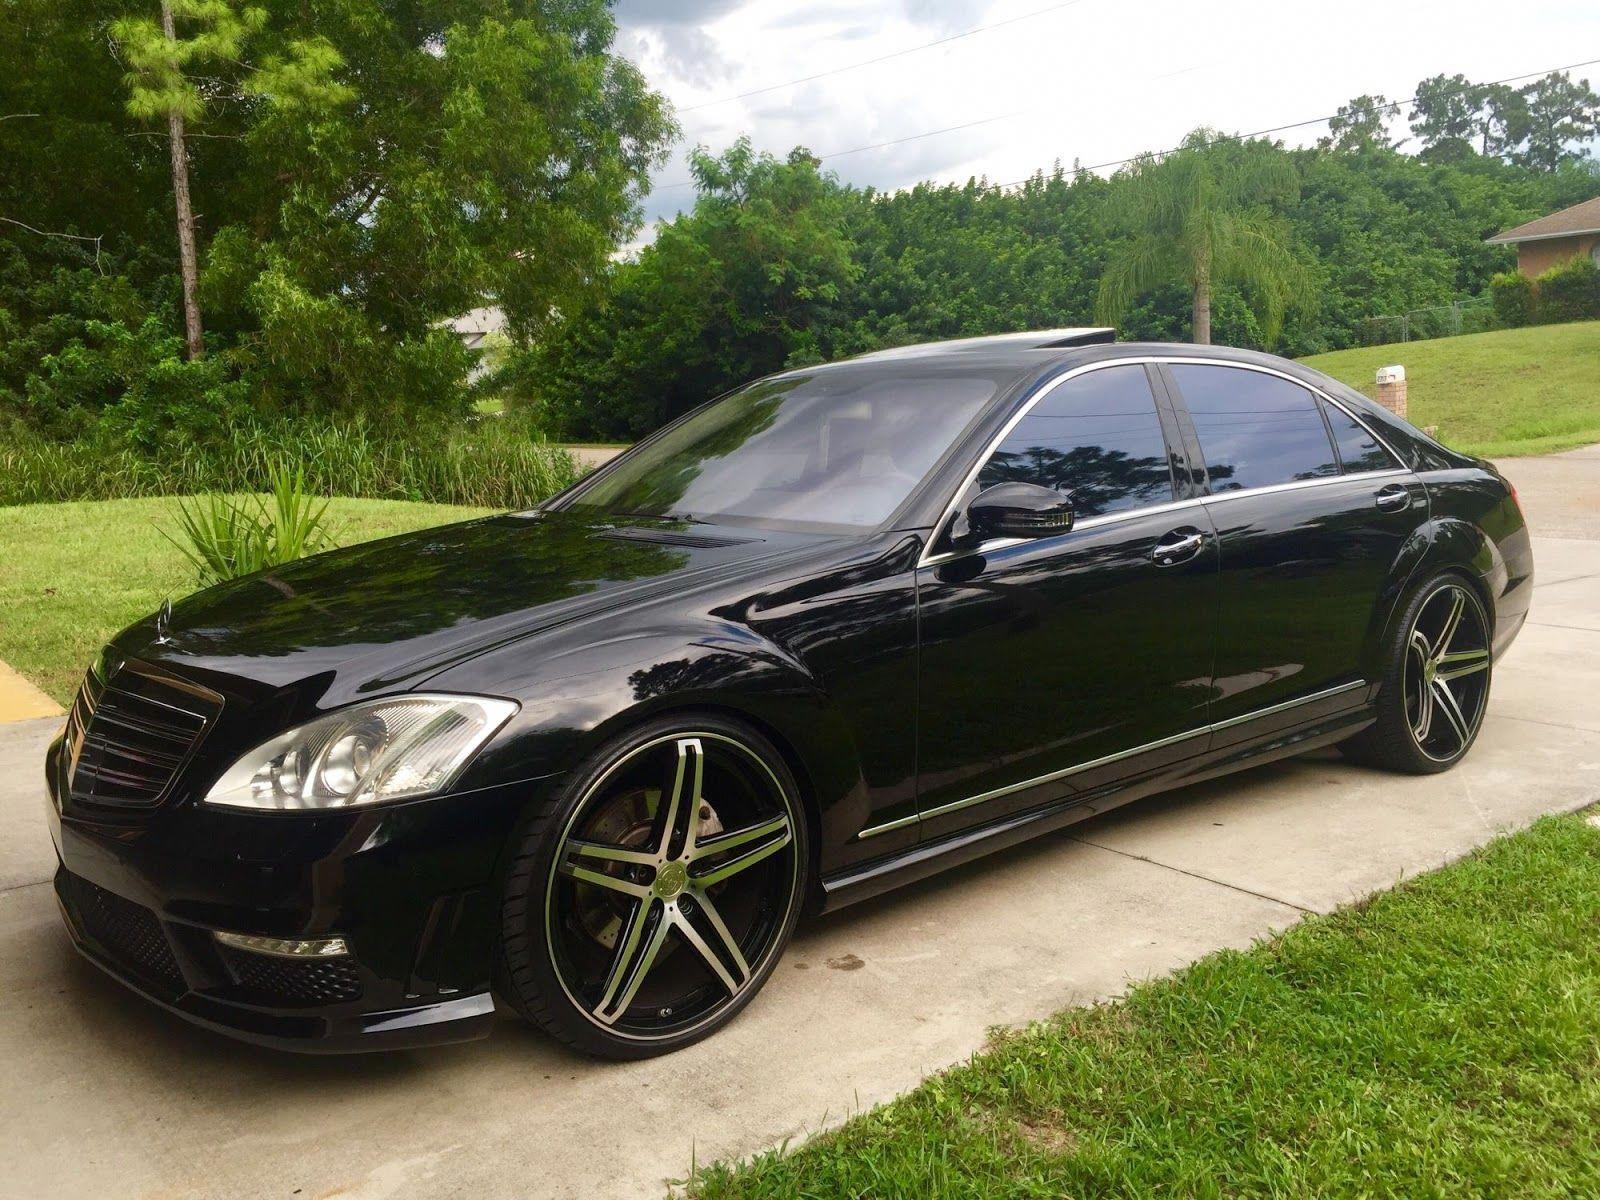 2007 Mercedes Benz S550 Amg W221 Luxurysportcarsmercedesbenz